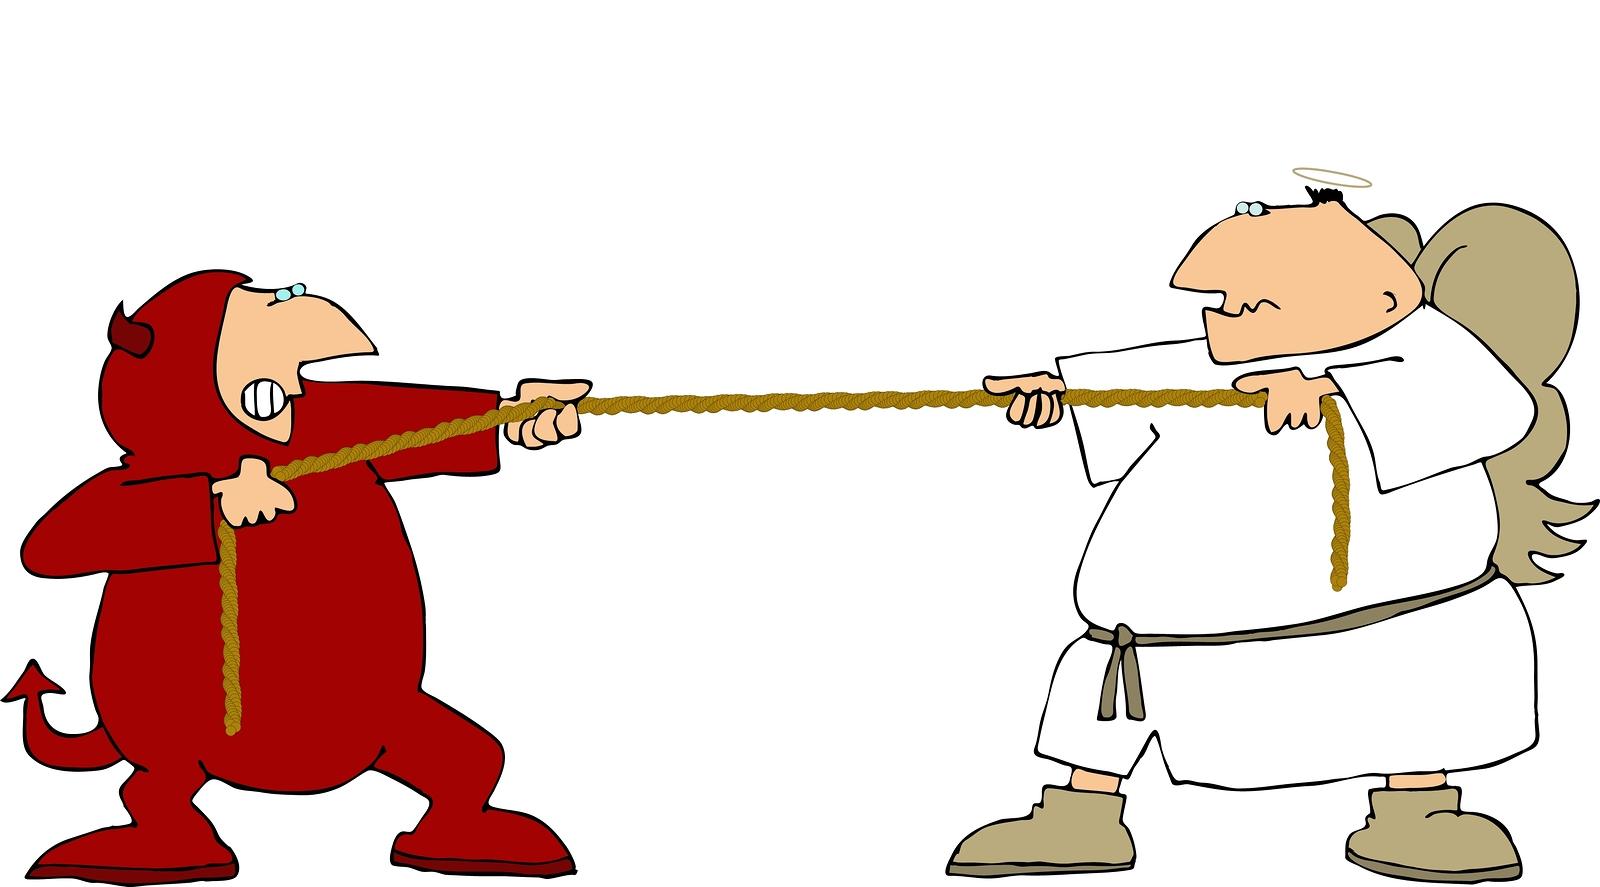 Bad grandma clipart image stock Good vs Bad Behavior | Shannon Mcfadden - Global Grandma - Clip Art ... image stock